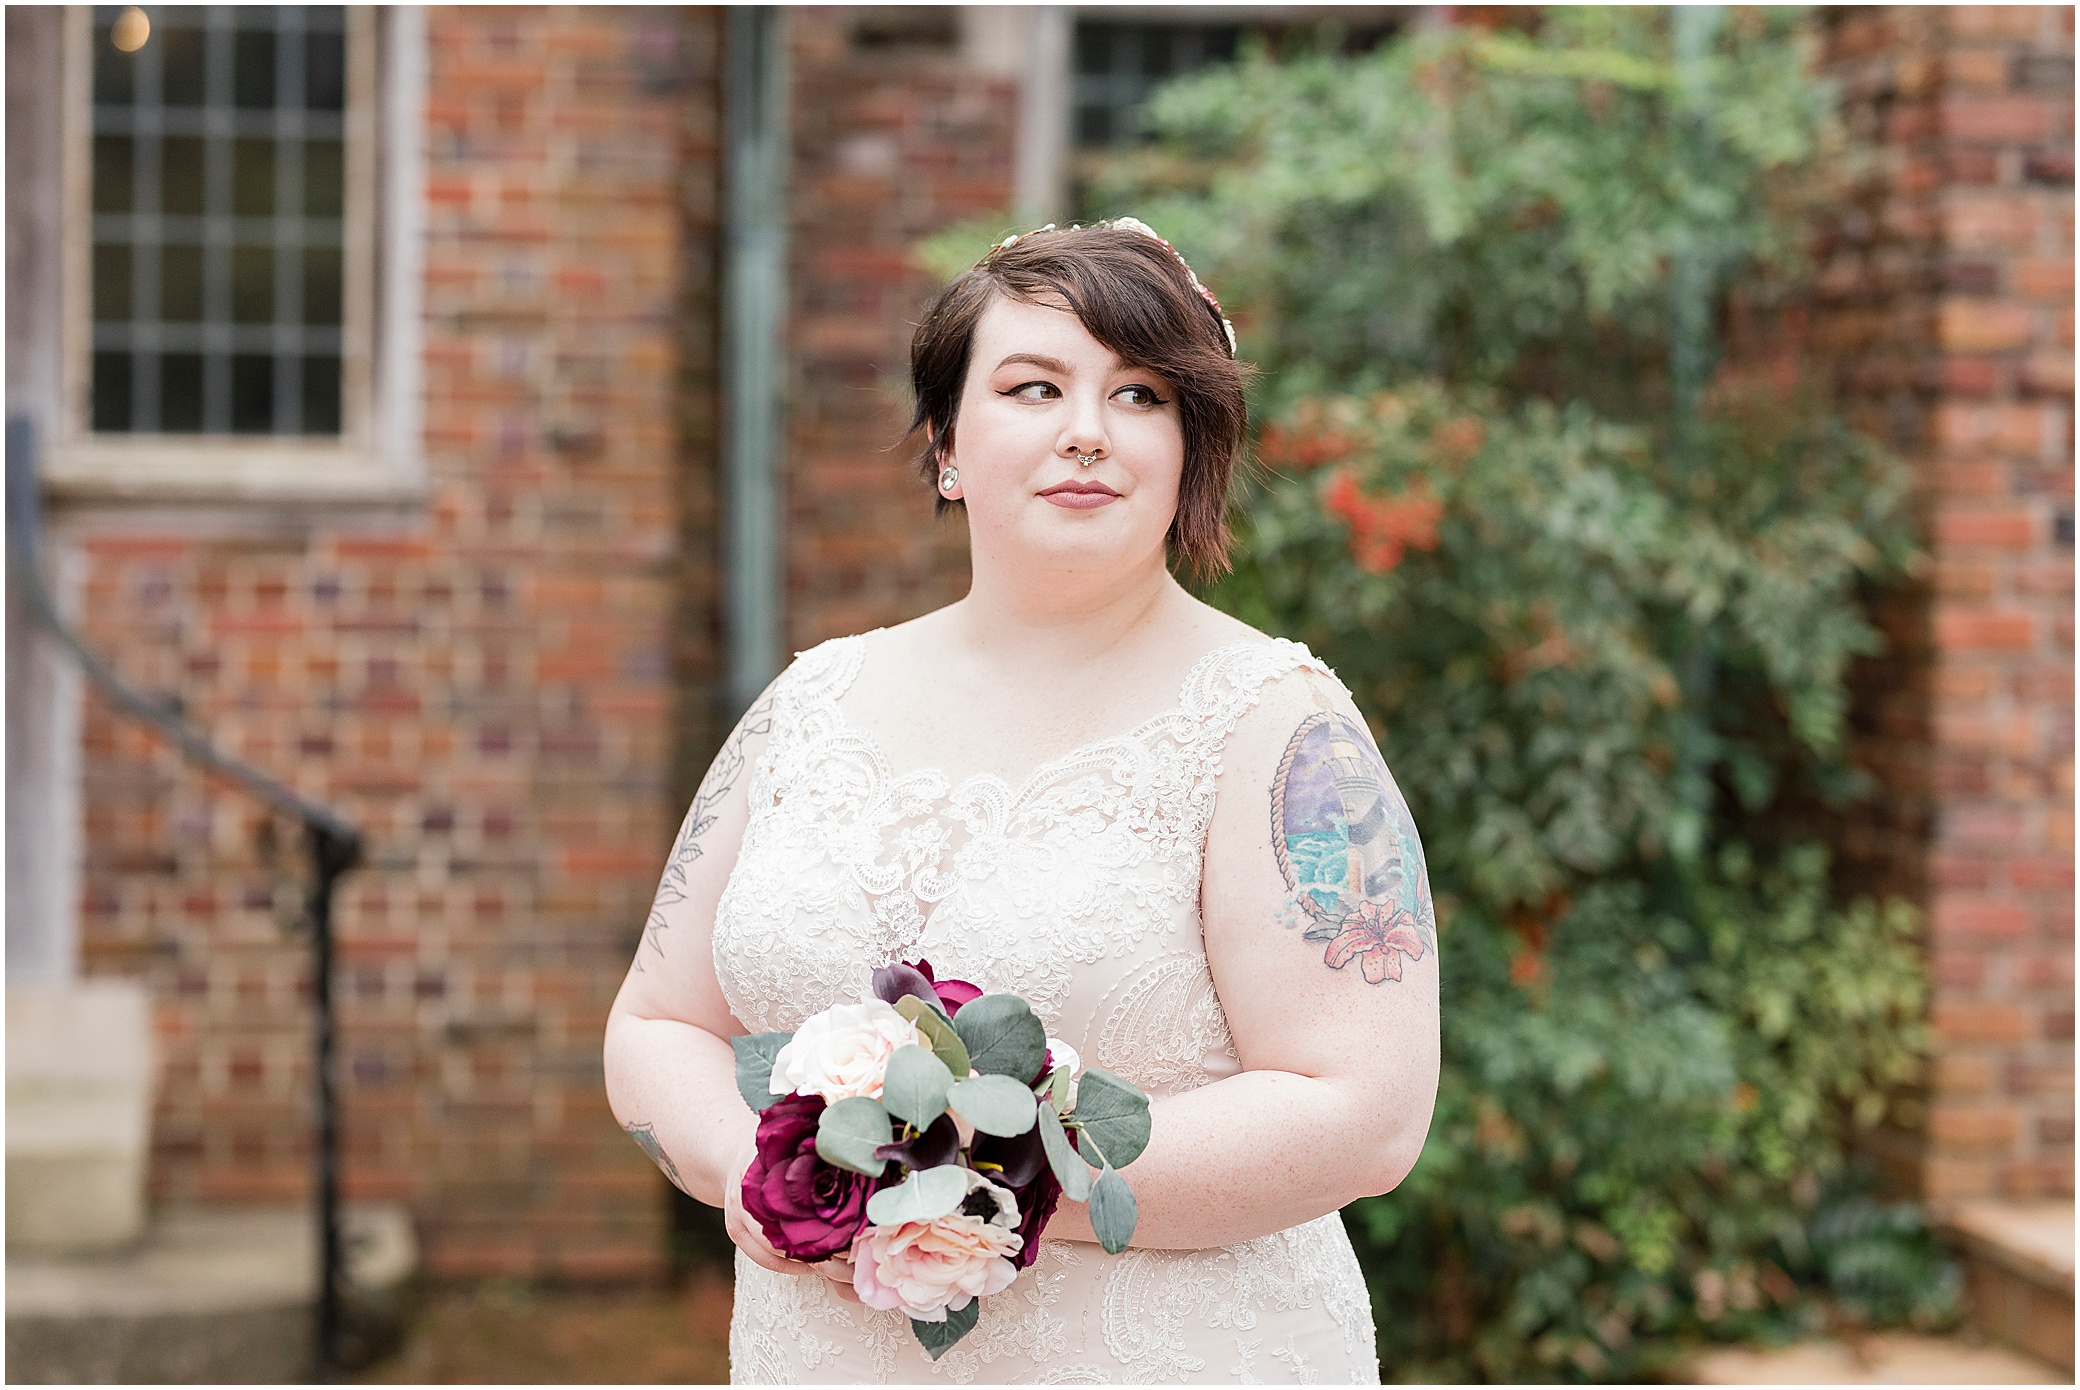 hermitage museum and gardens elopement, studio i do wedding dress, vintage bride and groom candid portraits, museum wedding,